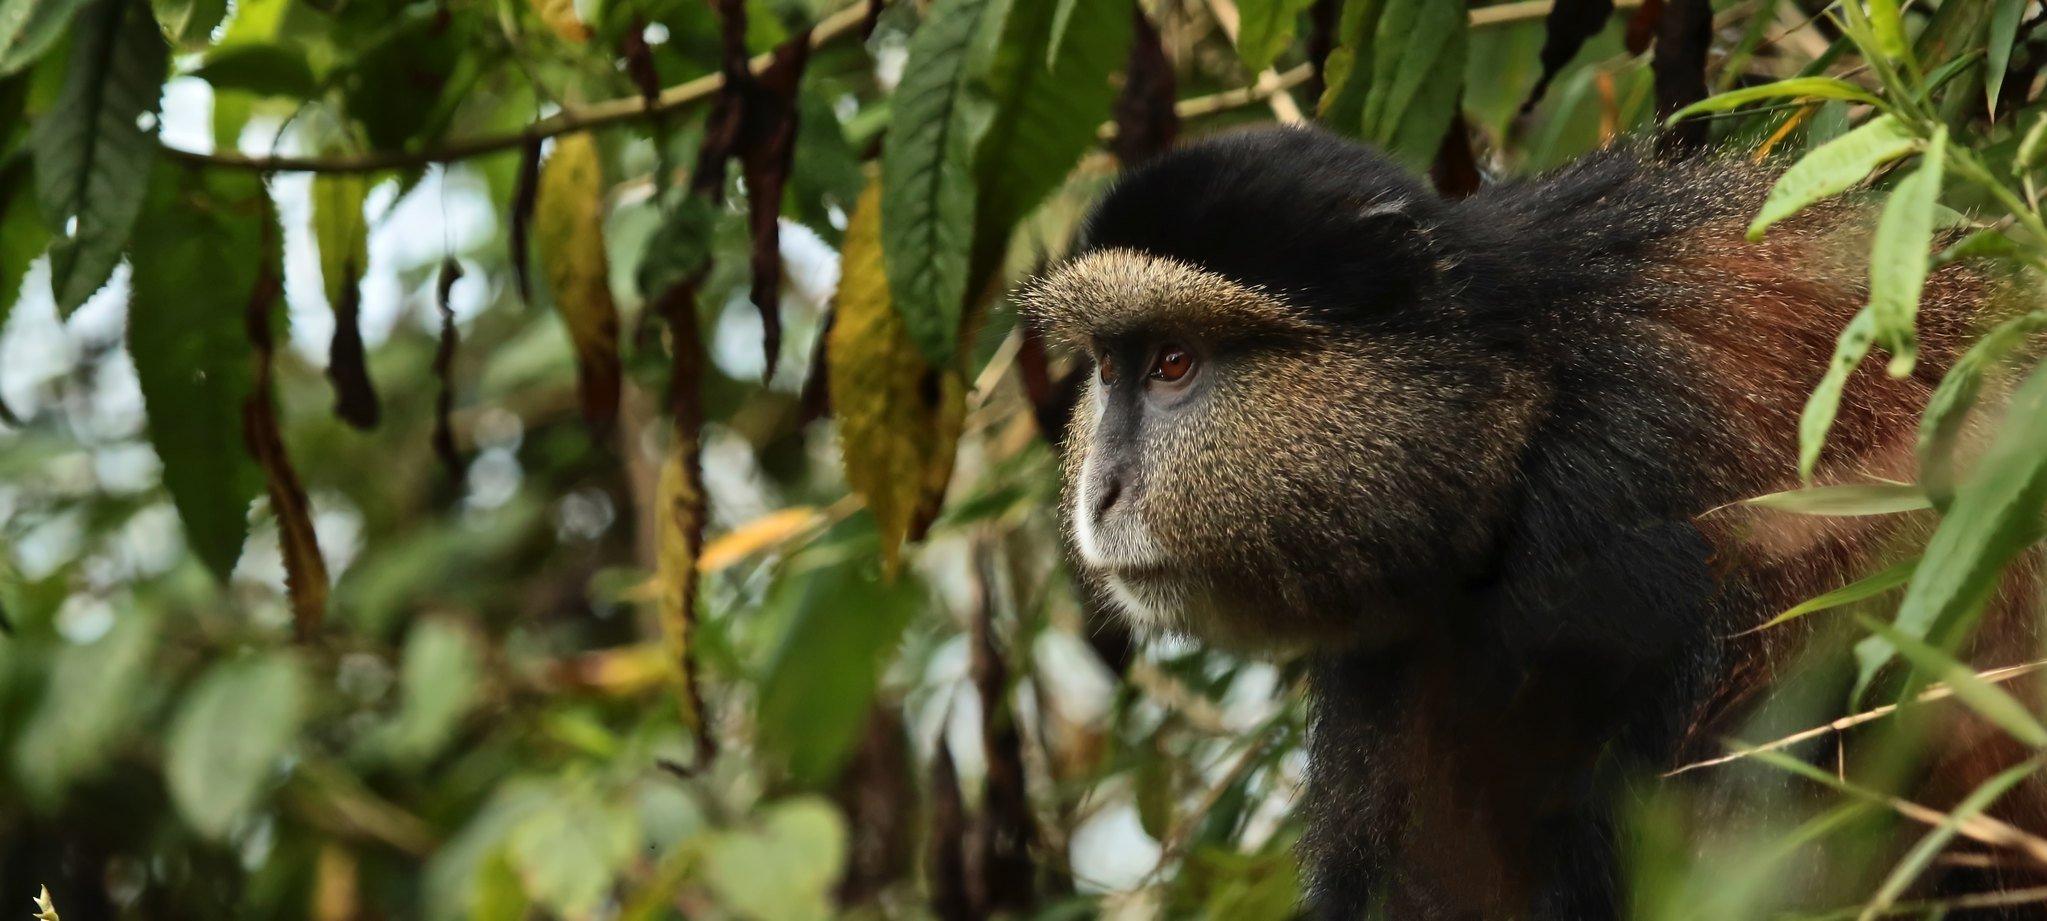 Golden monkey trekking